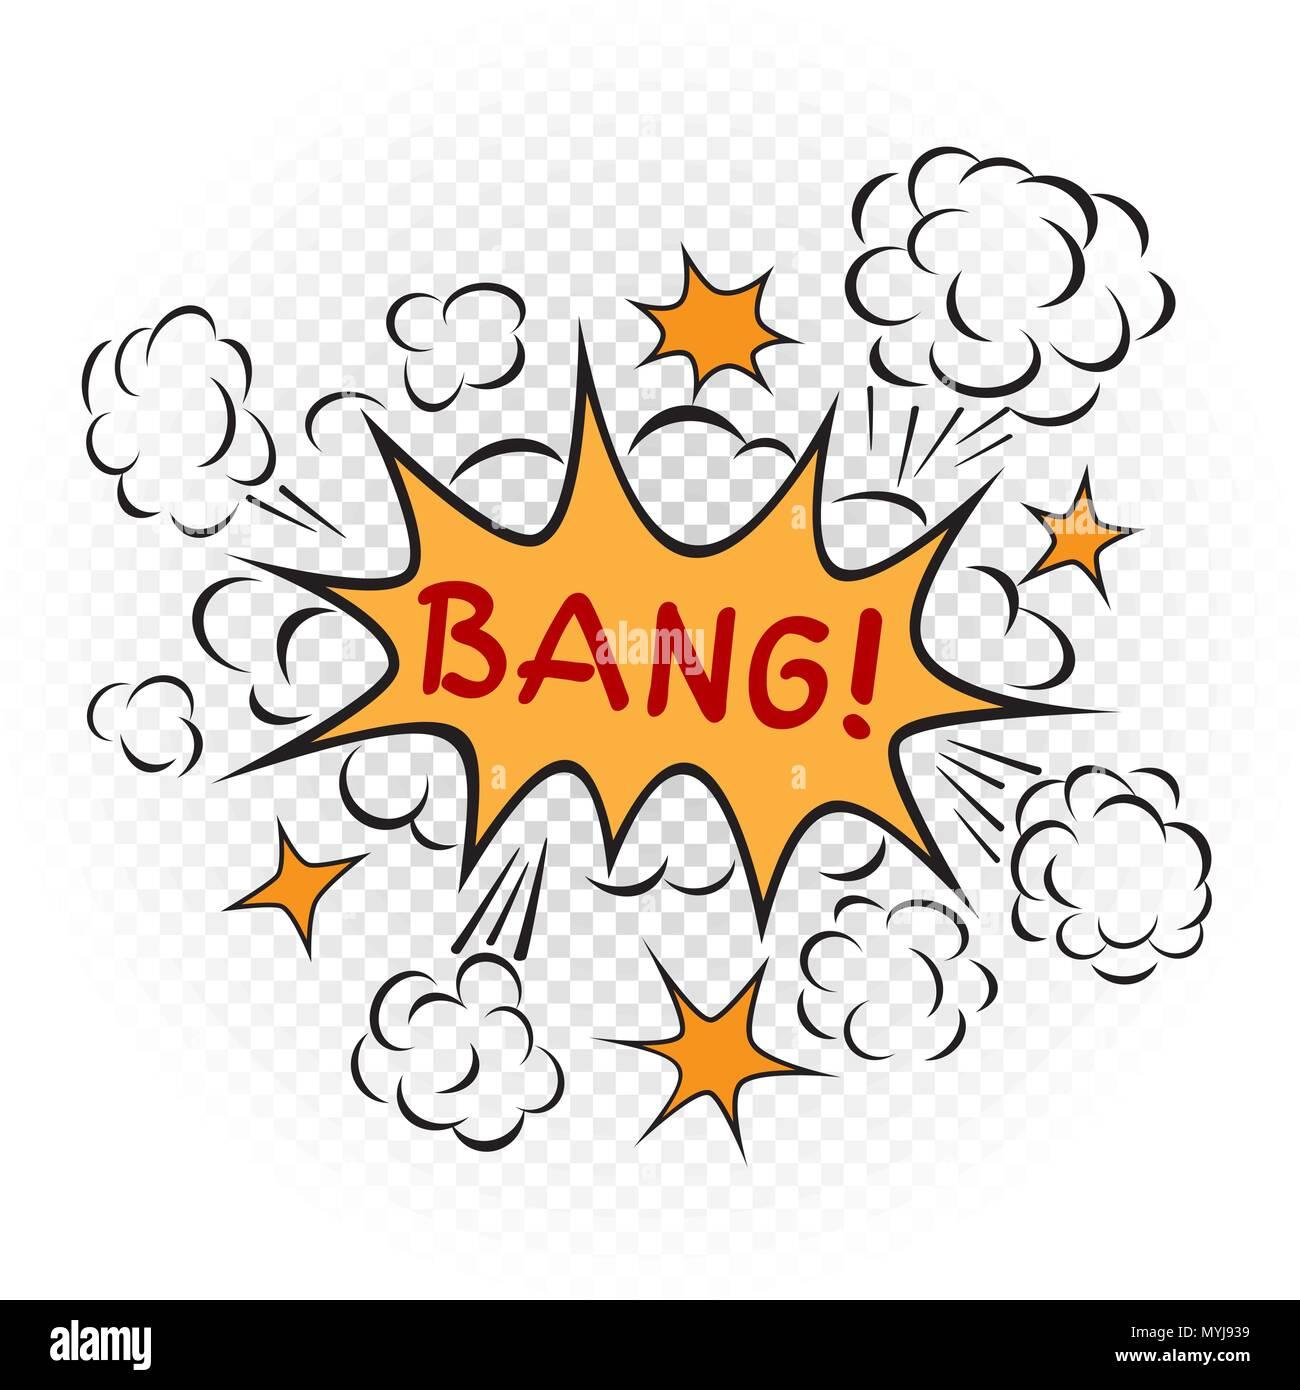 cartoon explosion illustration transparent - Stock Image